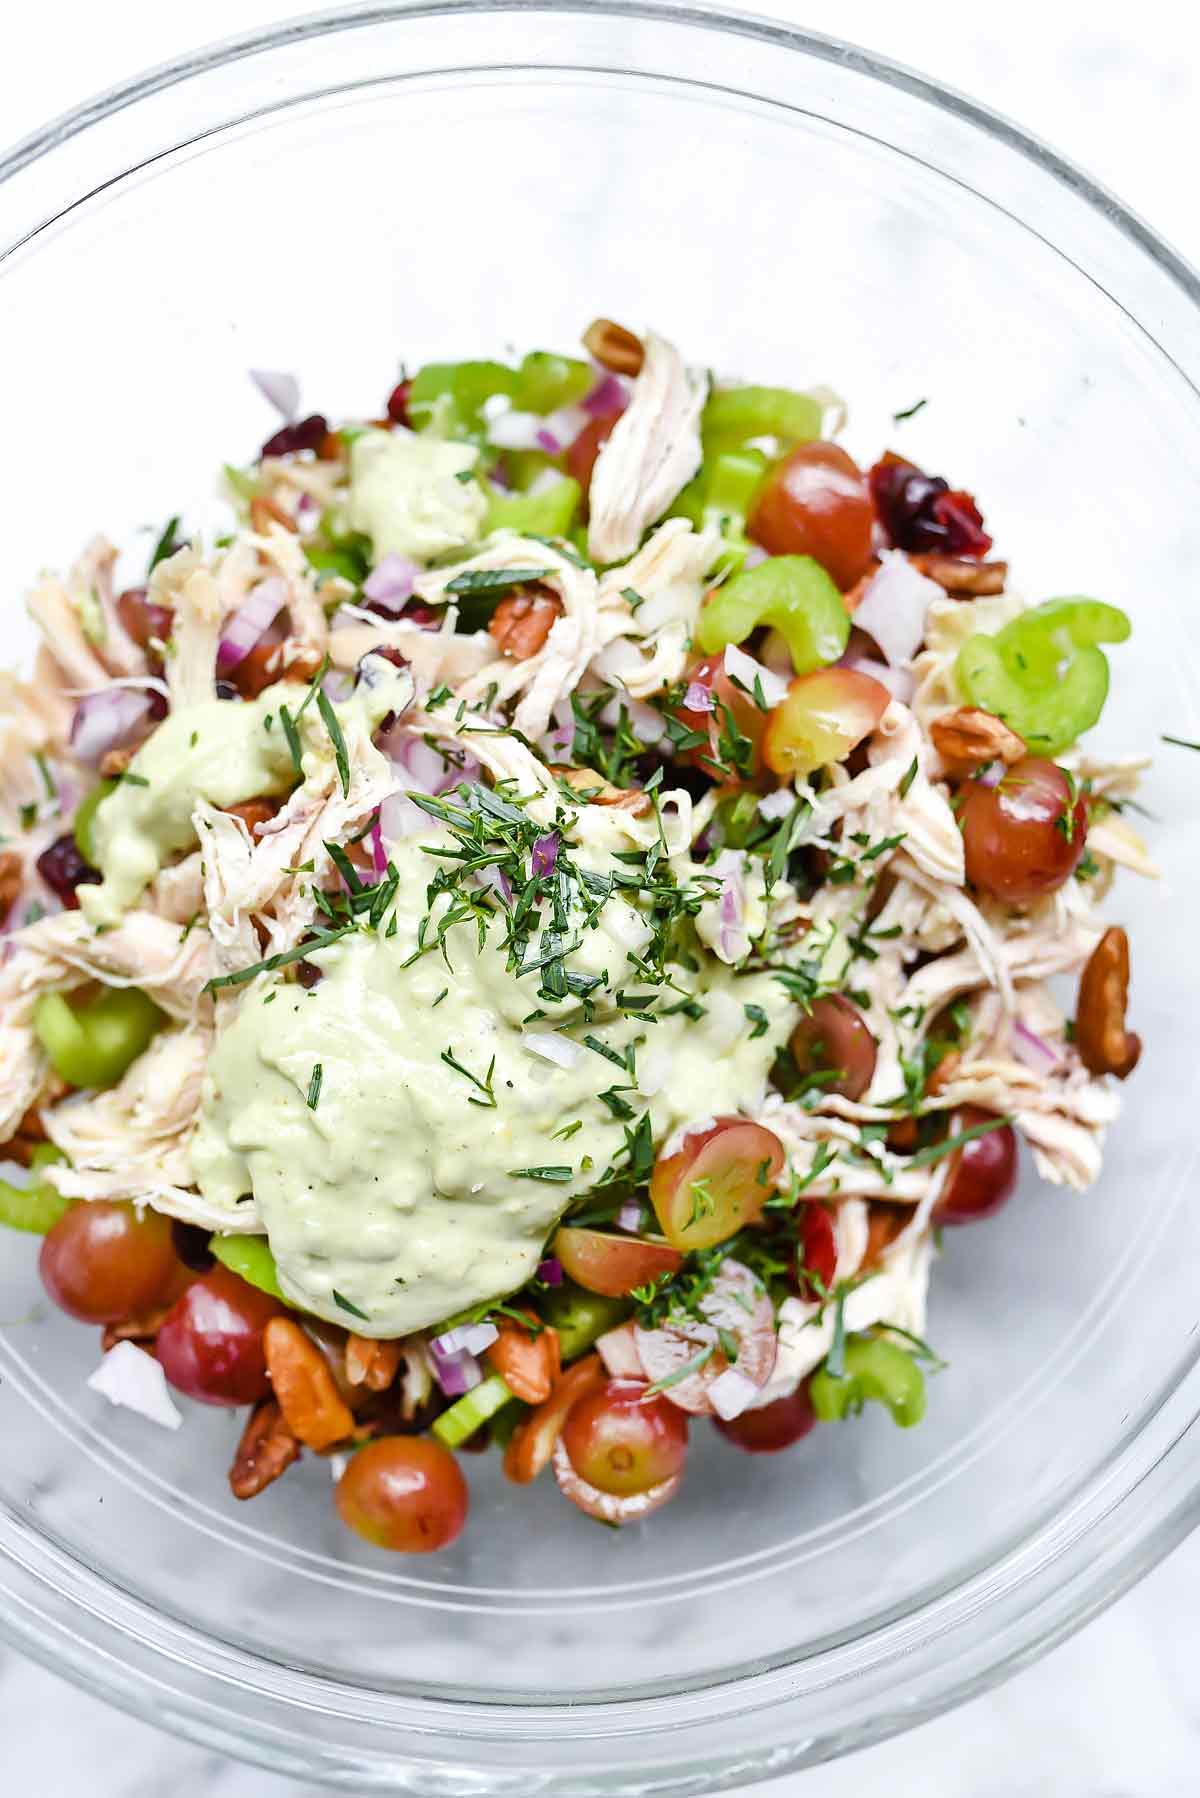 Avocado-Yogurt-Chicken-Salad-foodiecrush.com-004.jpg